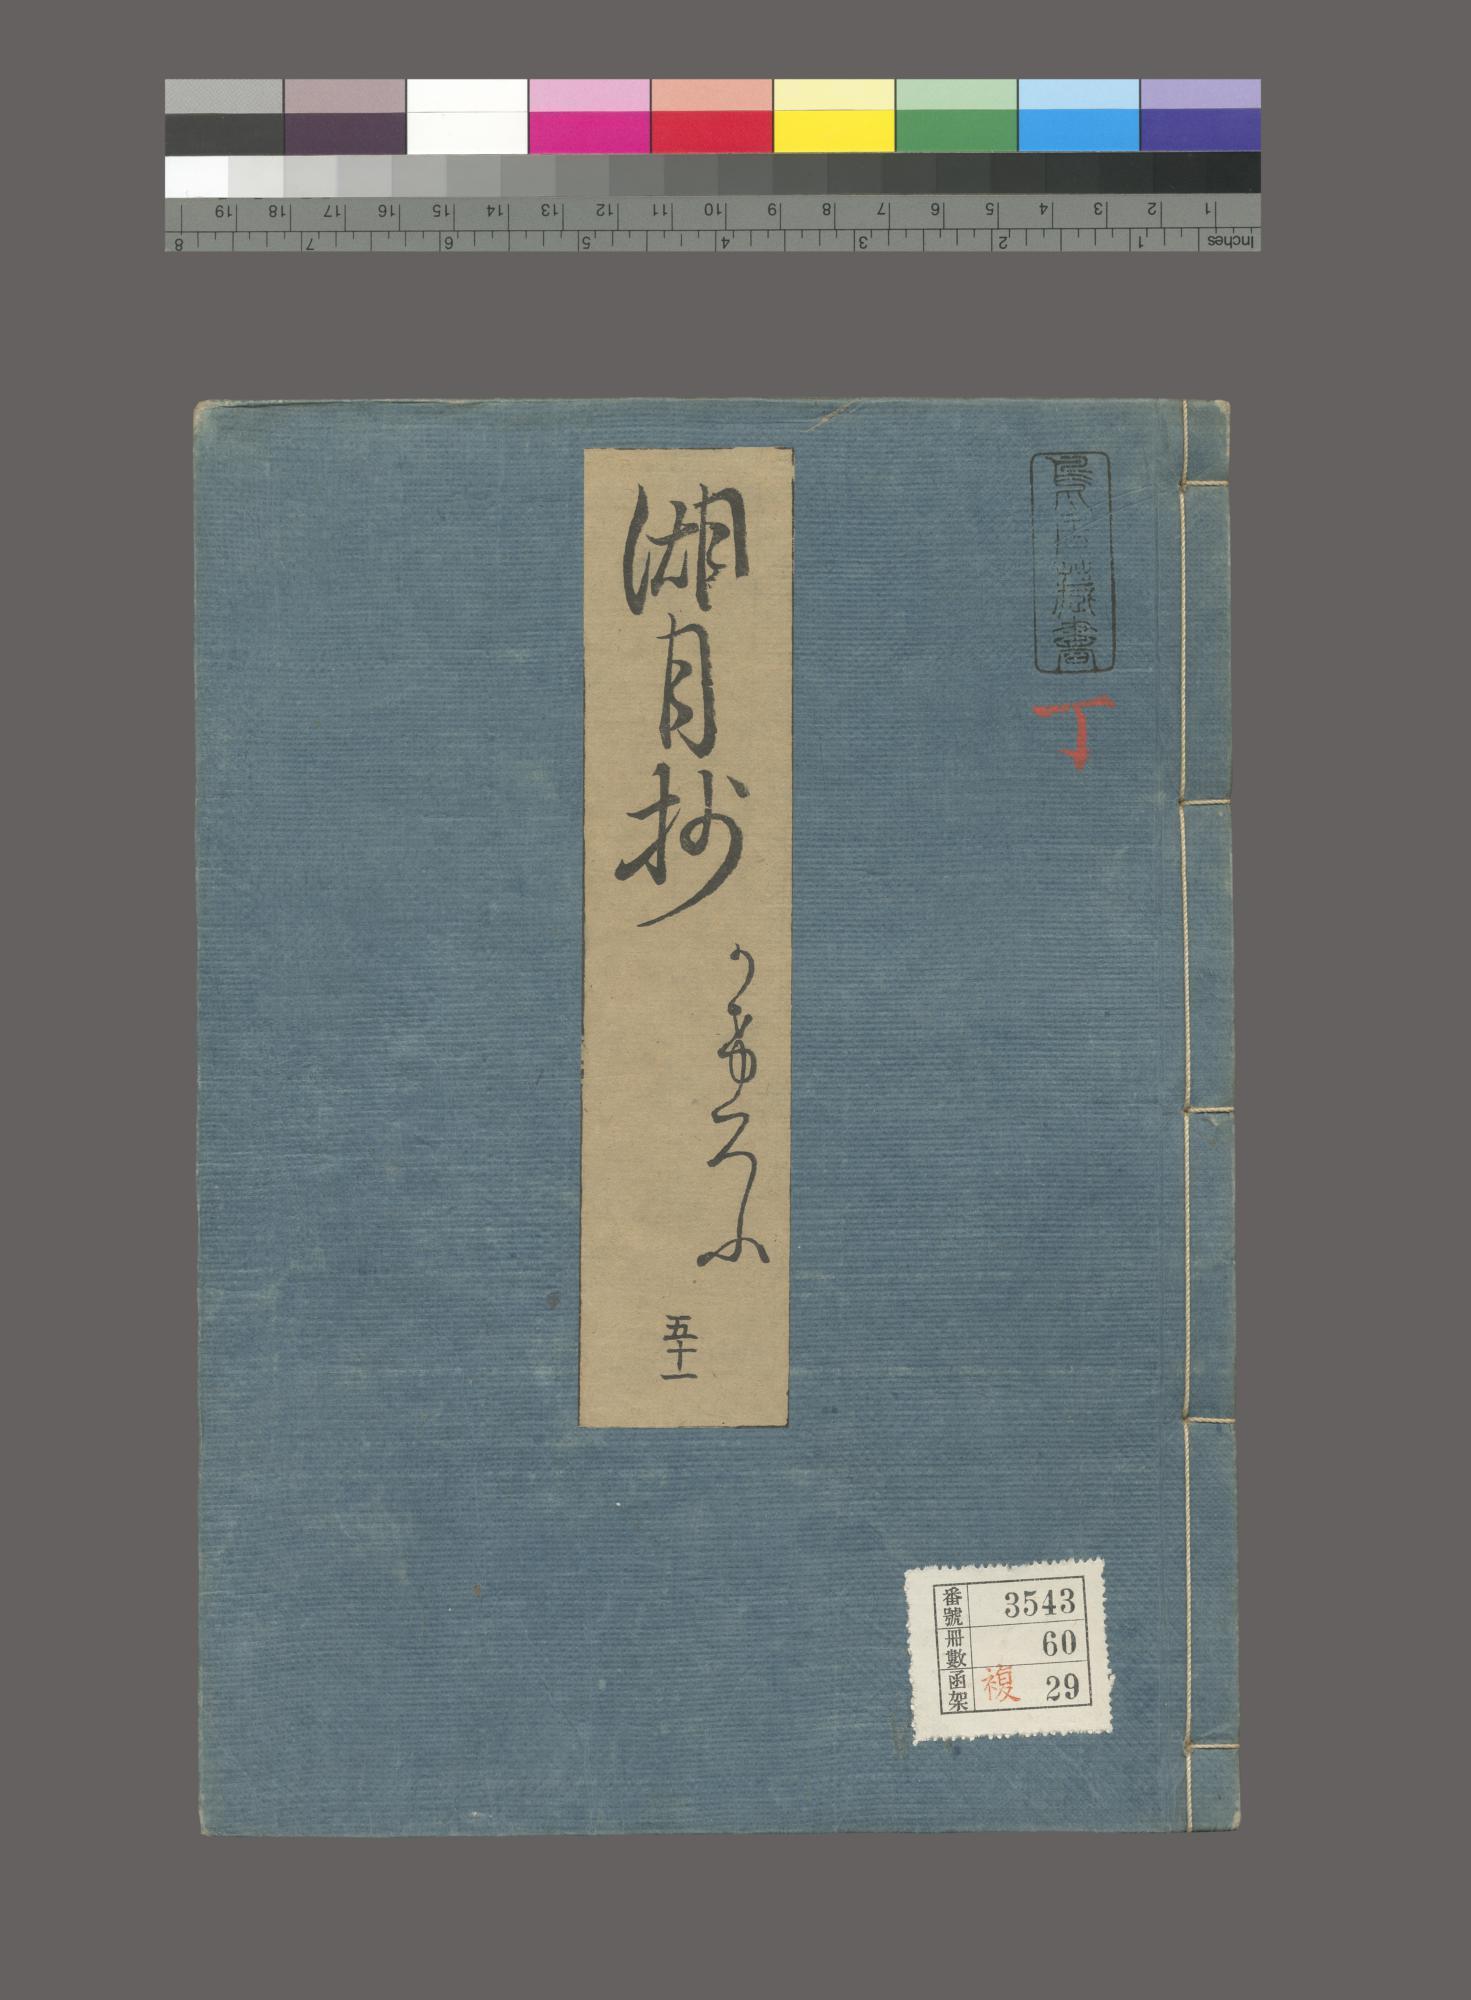 Genji monogatari kogetsu shō (The Tale of Genji)